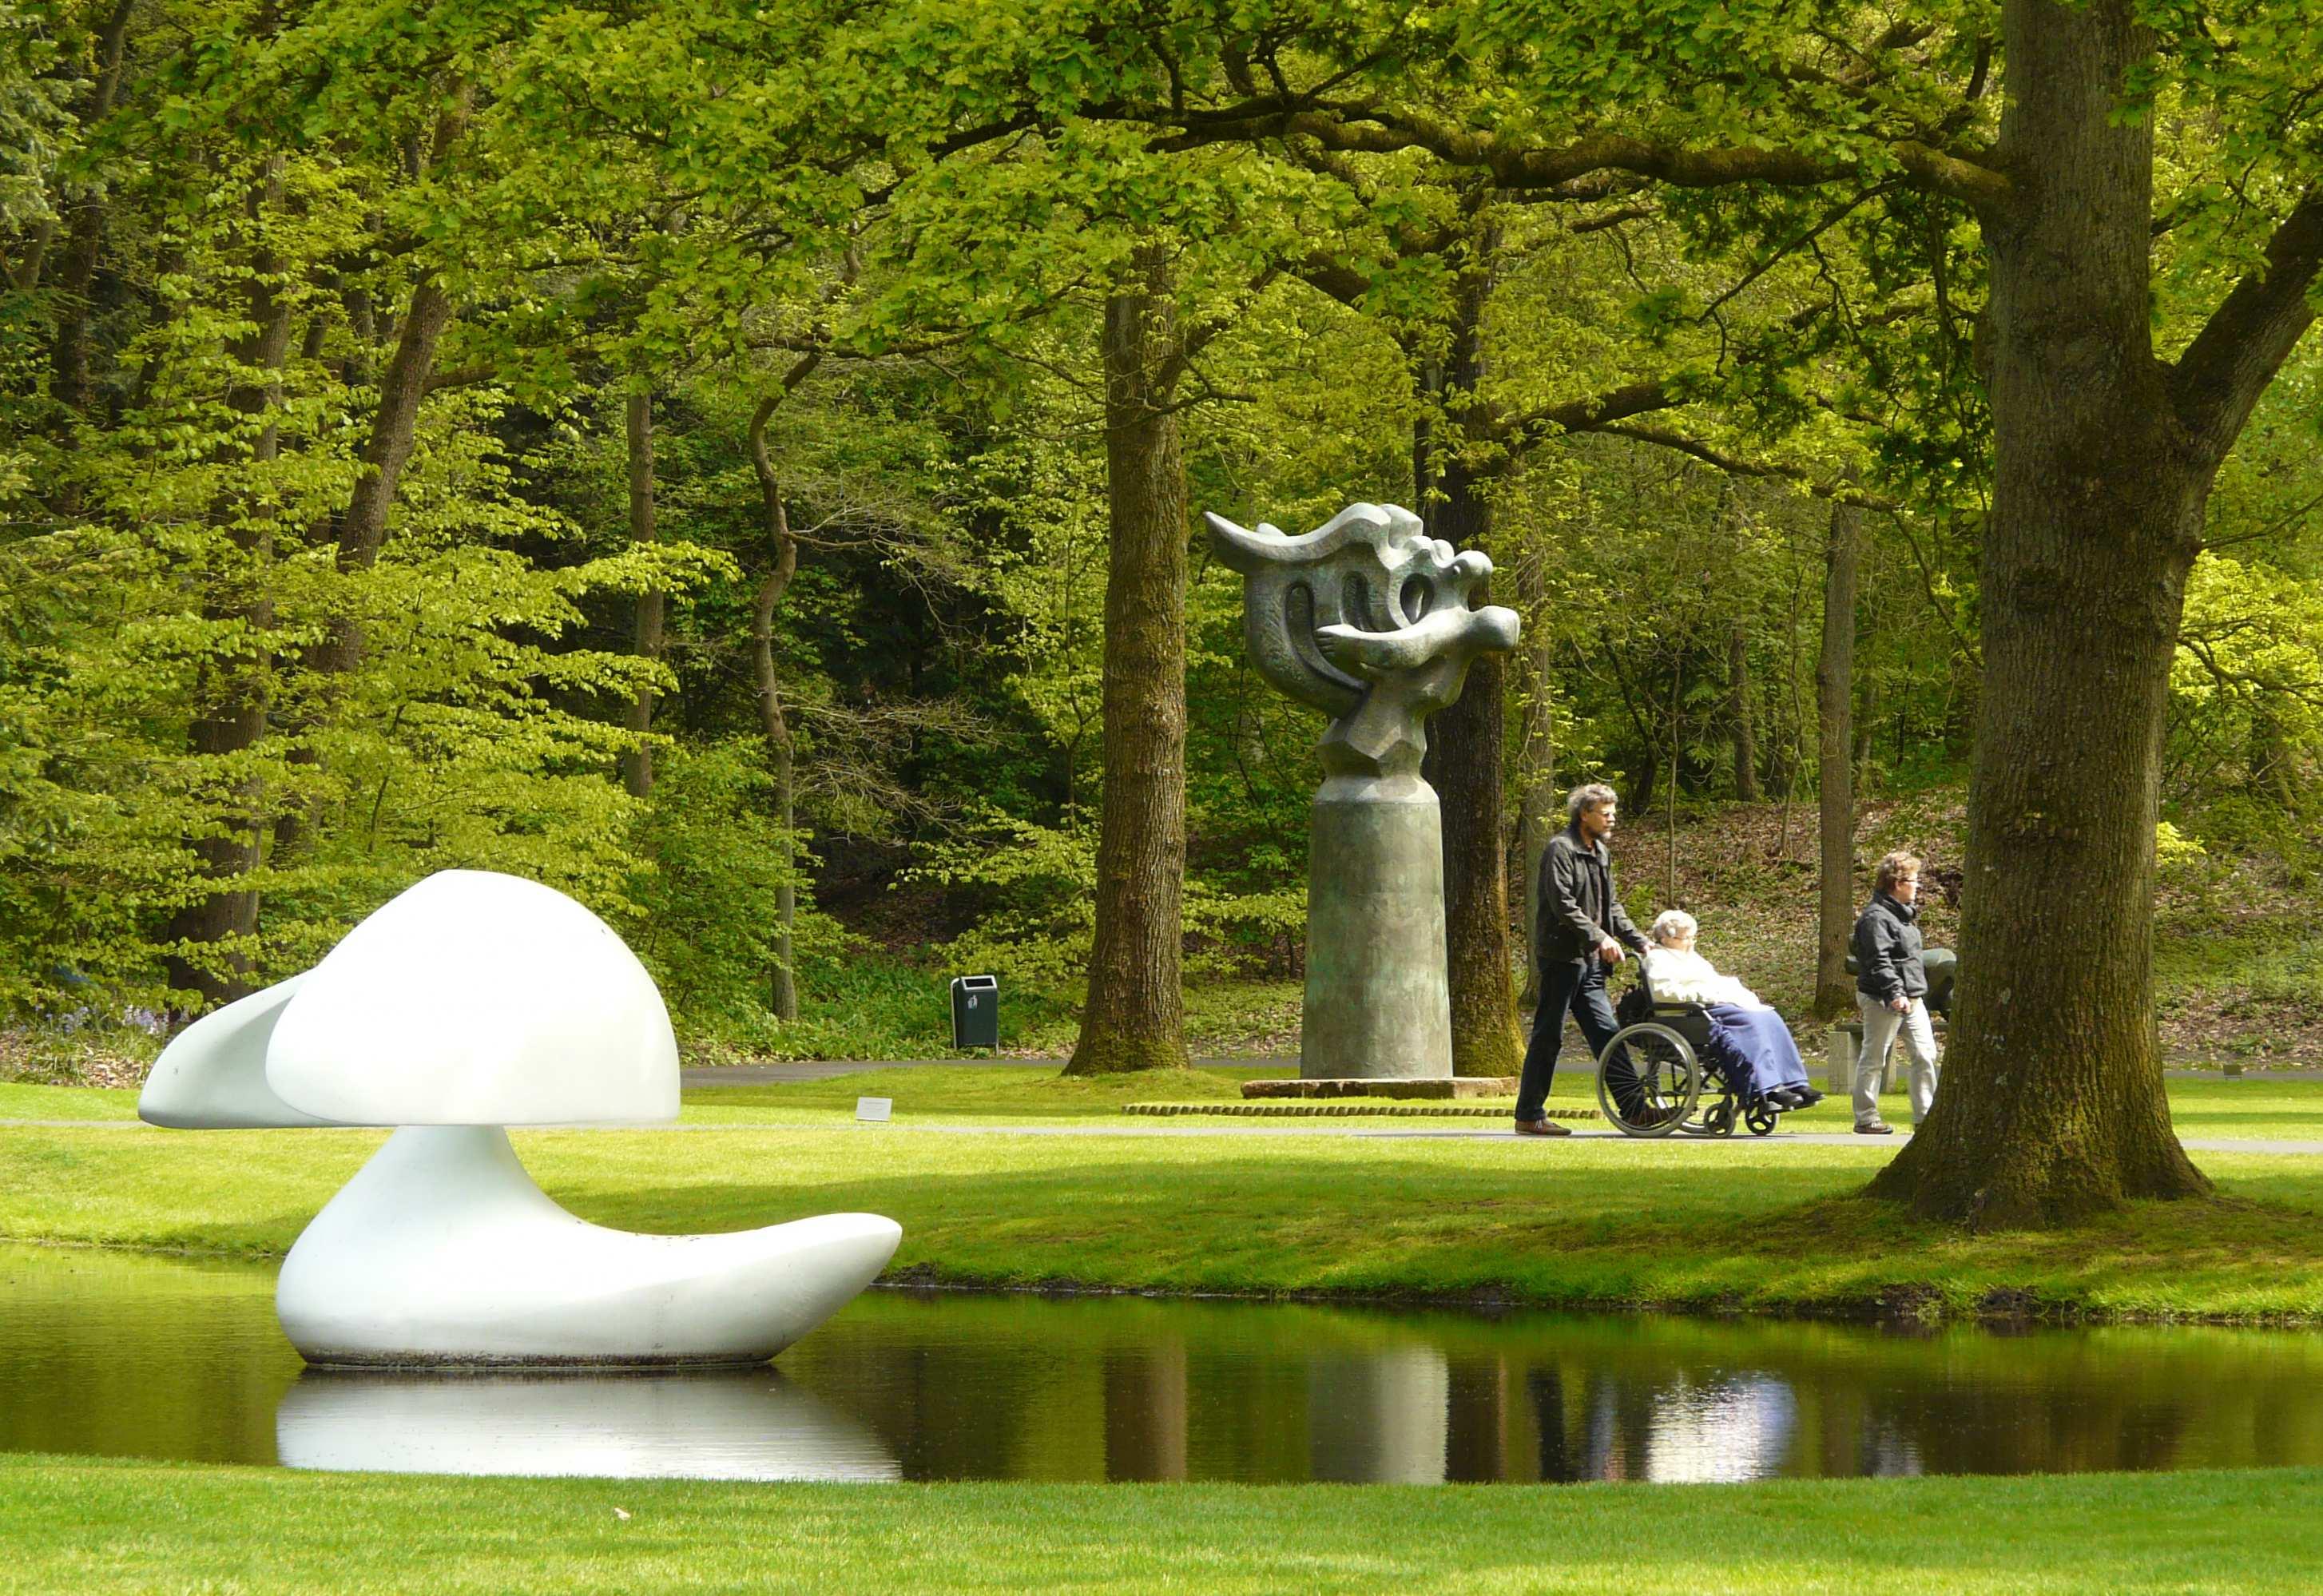 Hoge Veluwe Netherlands Art Nature And Distant Gunfire